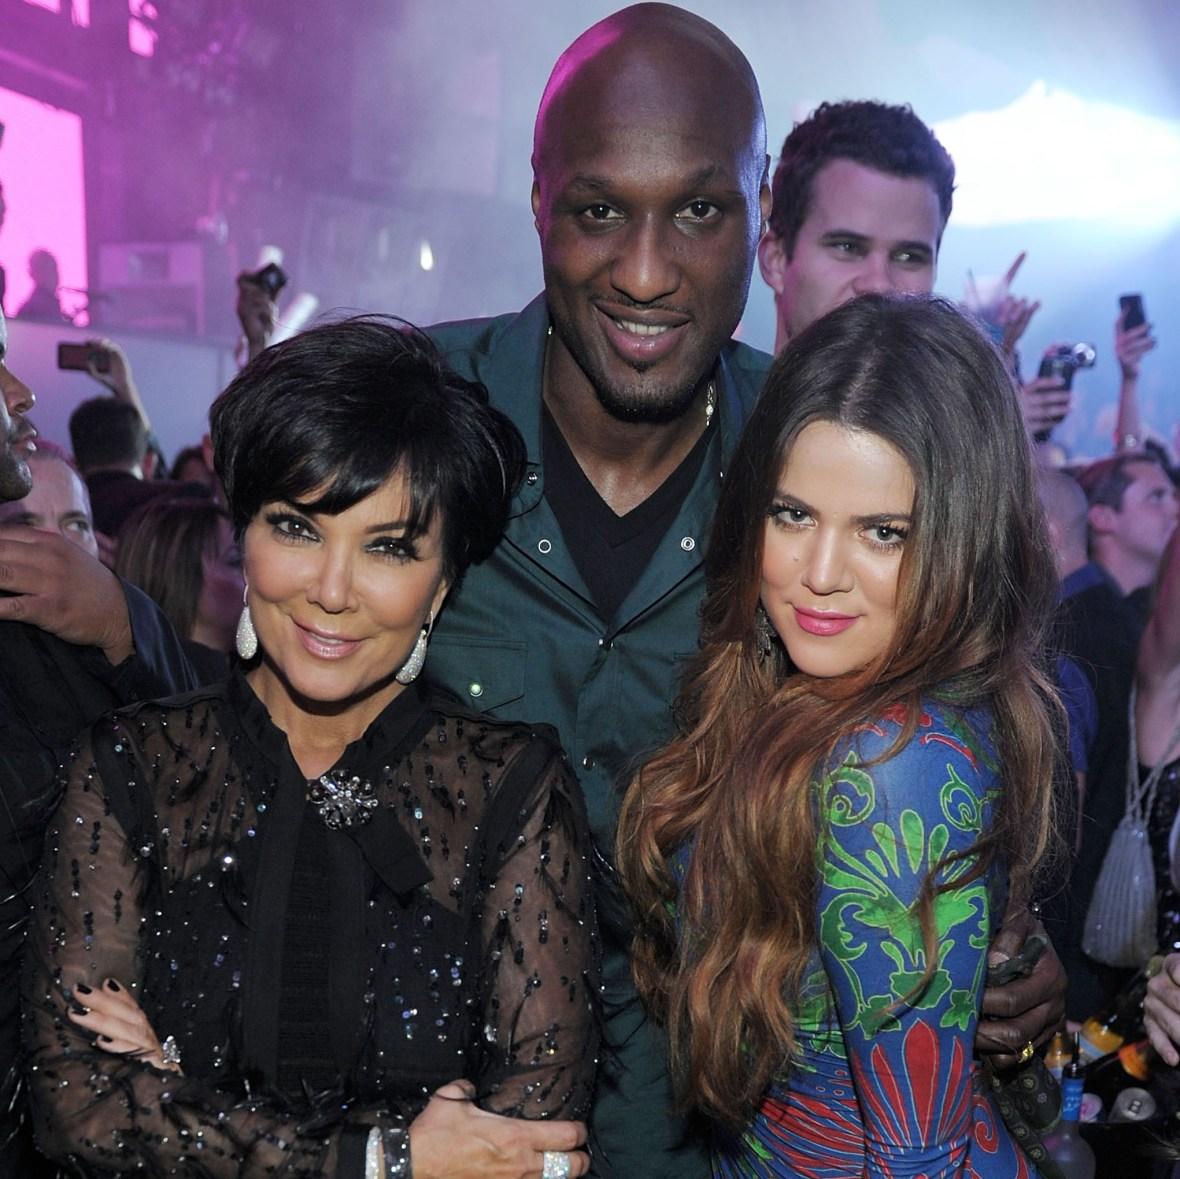 khloe kardashian lamar odom kris jenner getty images